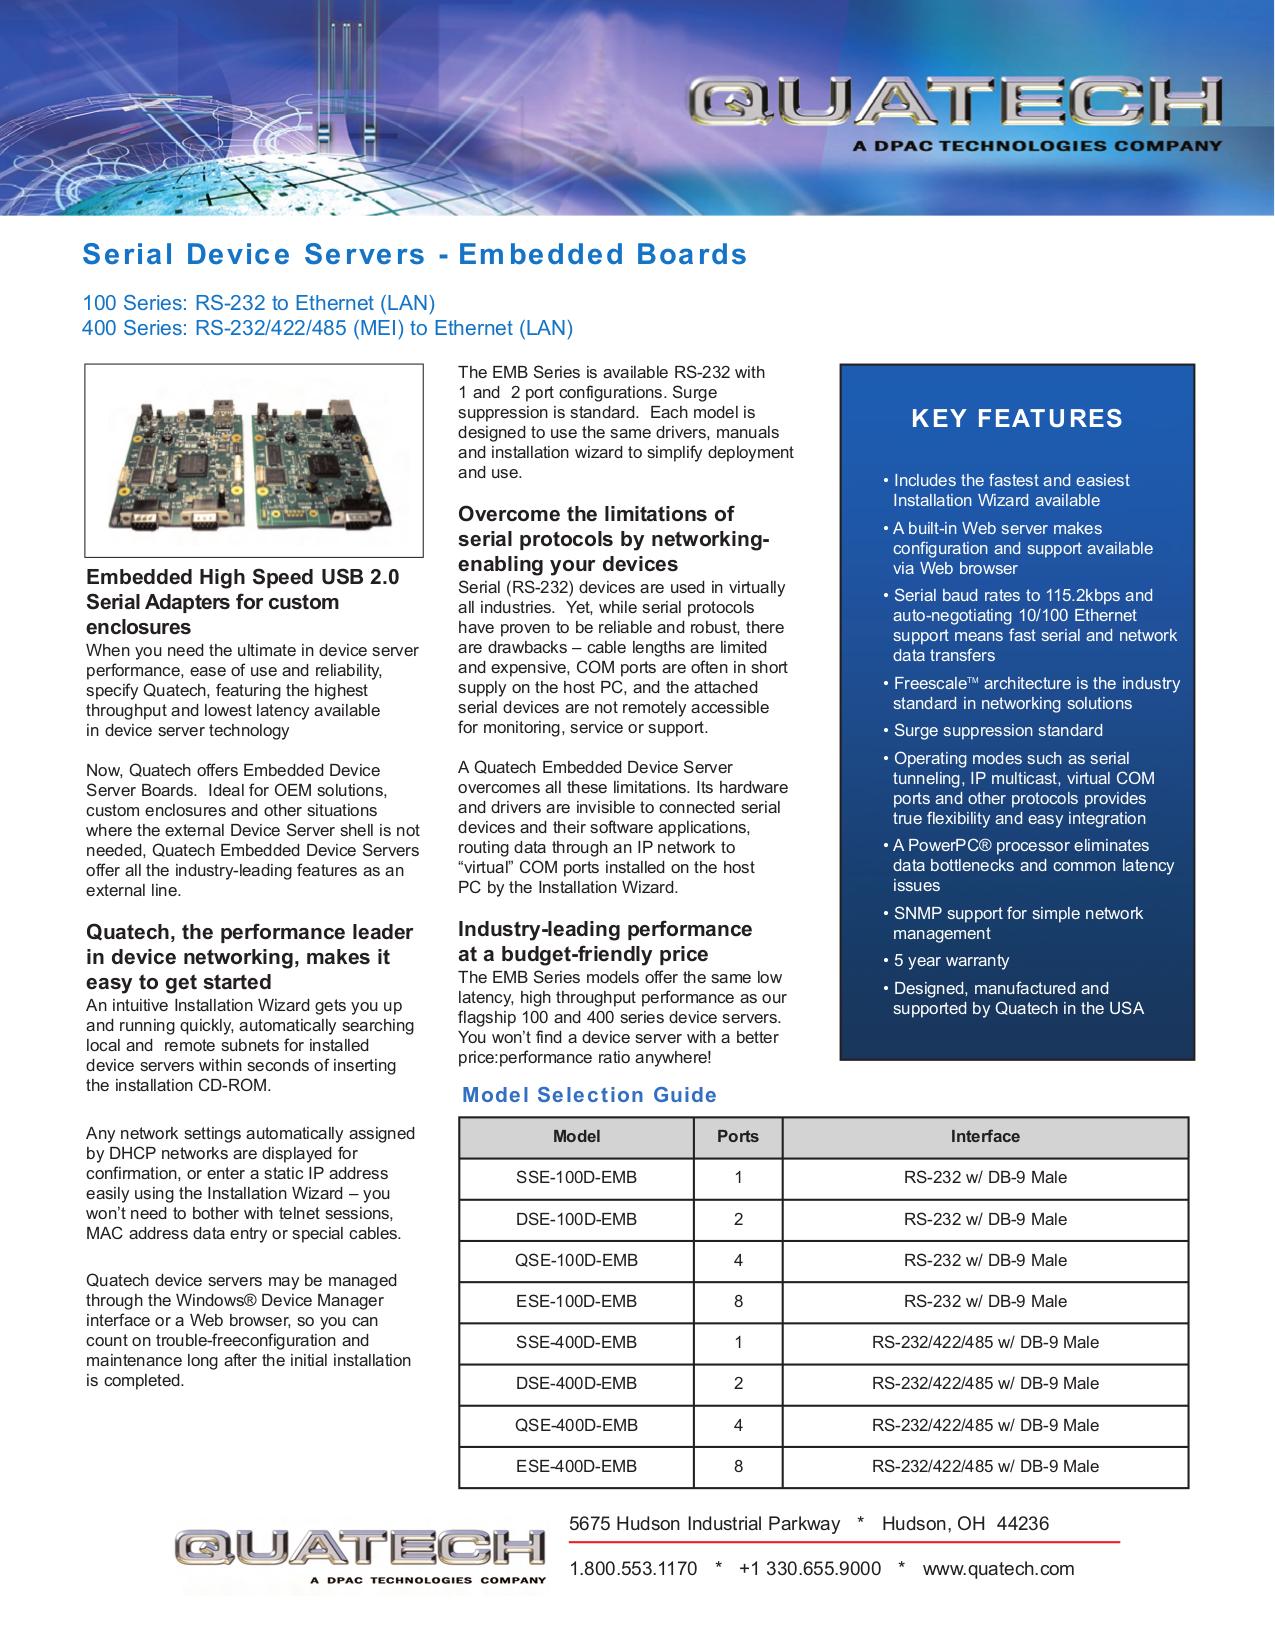 Download free pdf for Quatech QSE-100D Servers Other manual